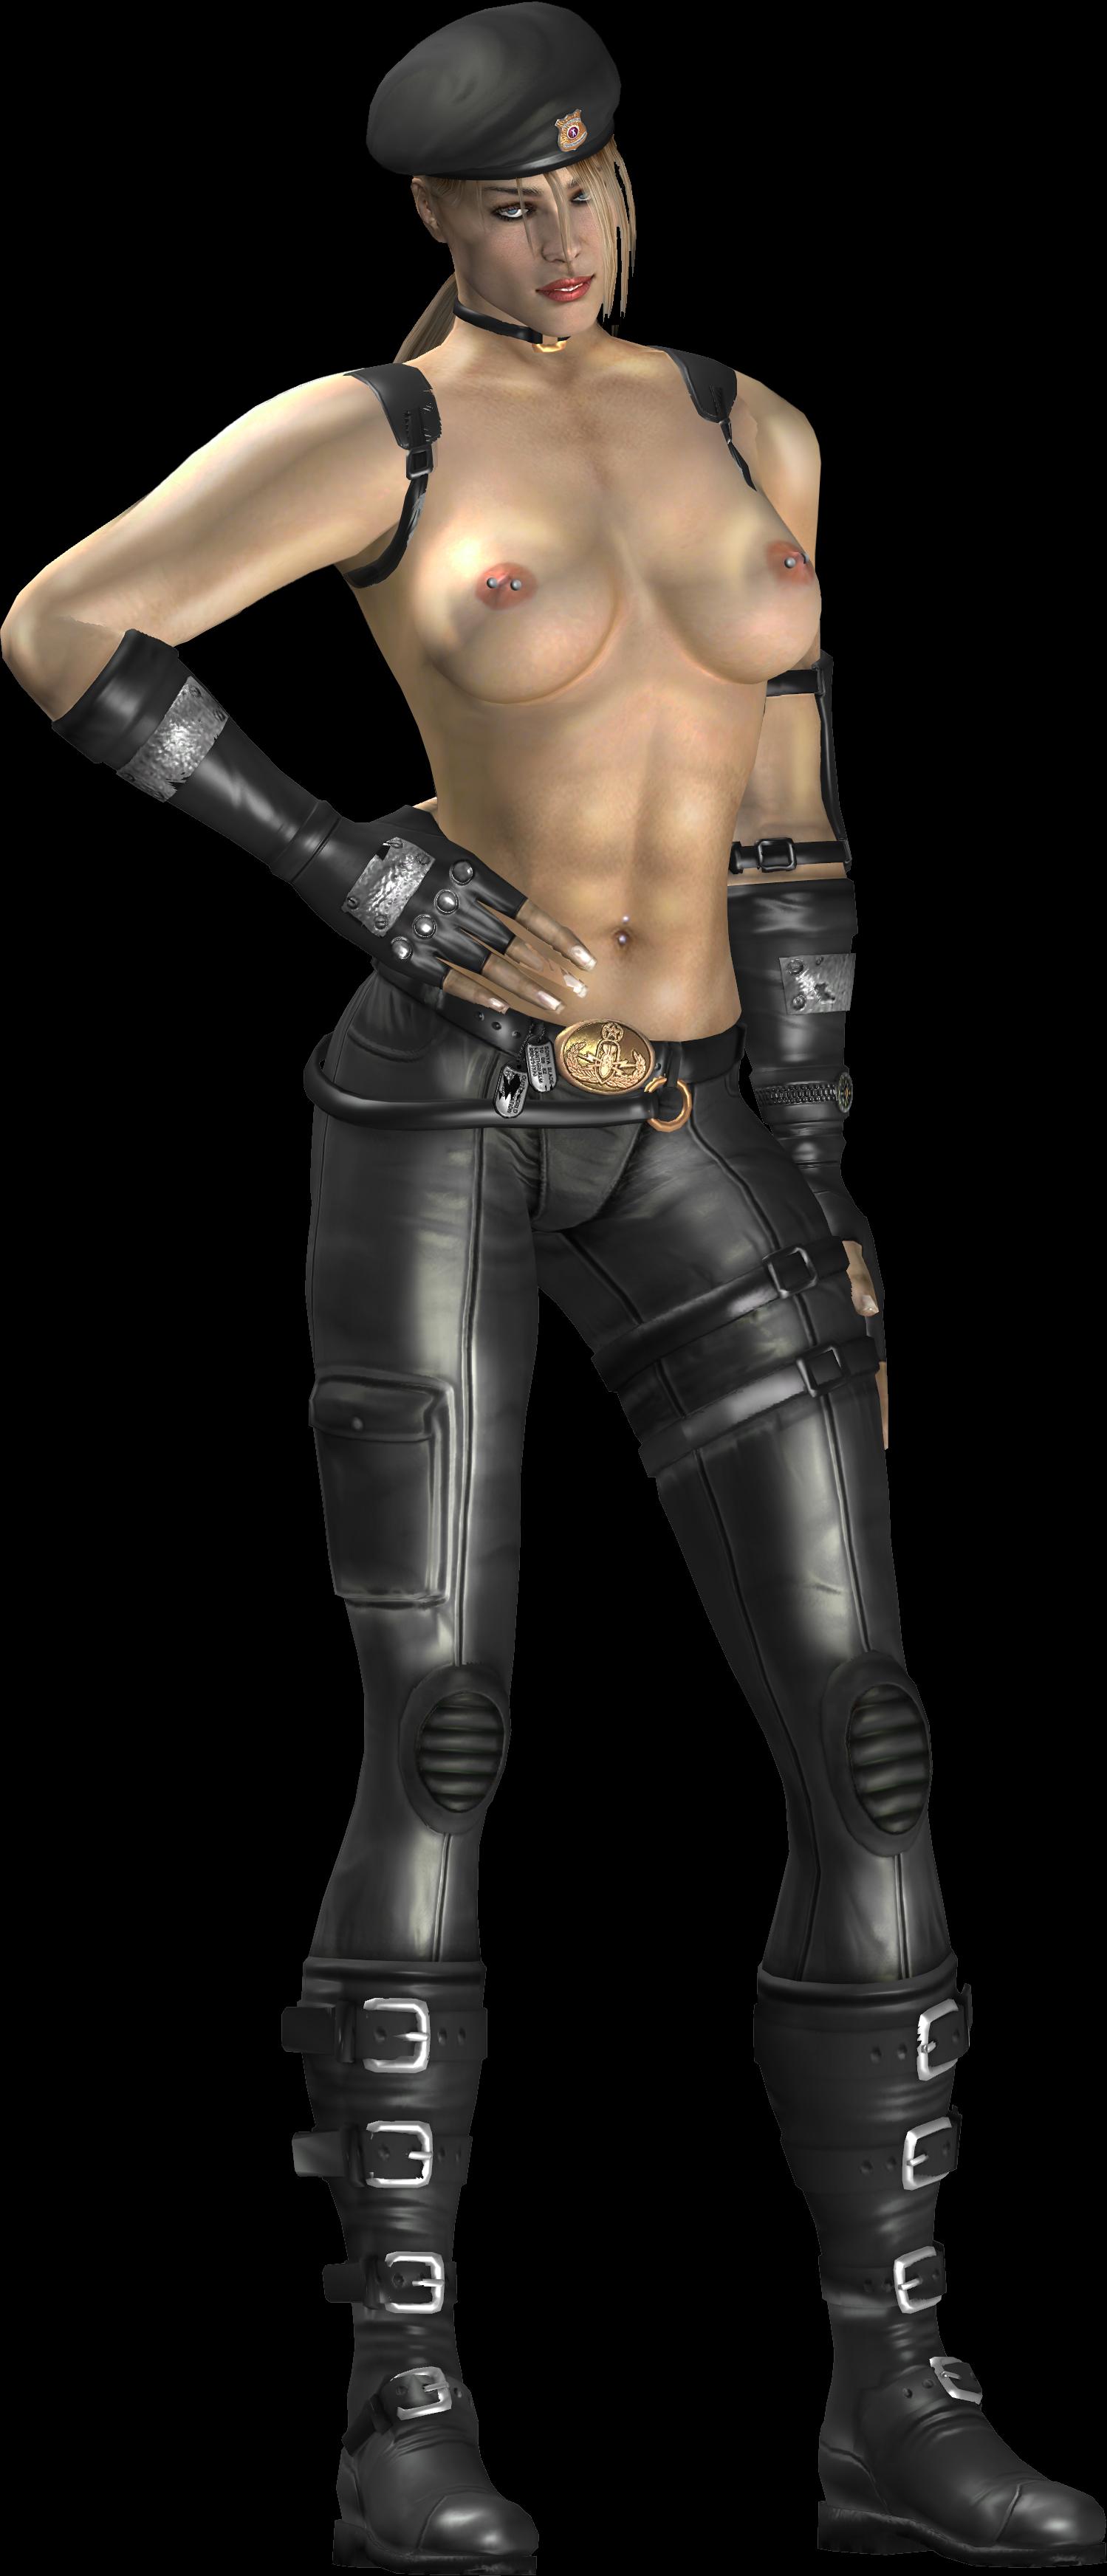 Sonya Blade Nude Hentai